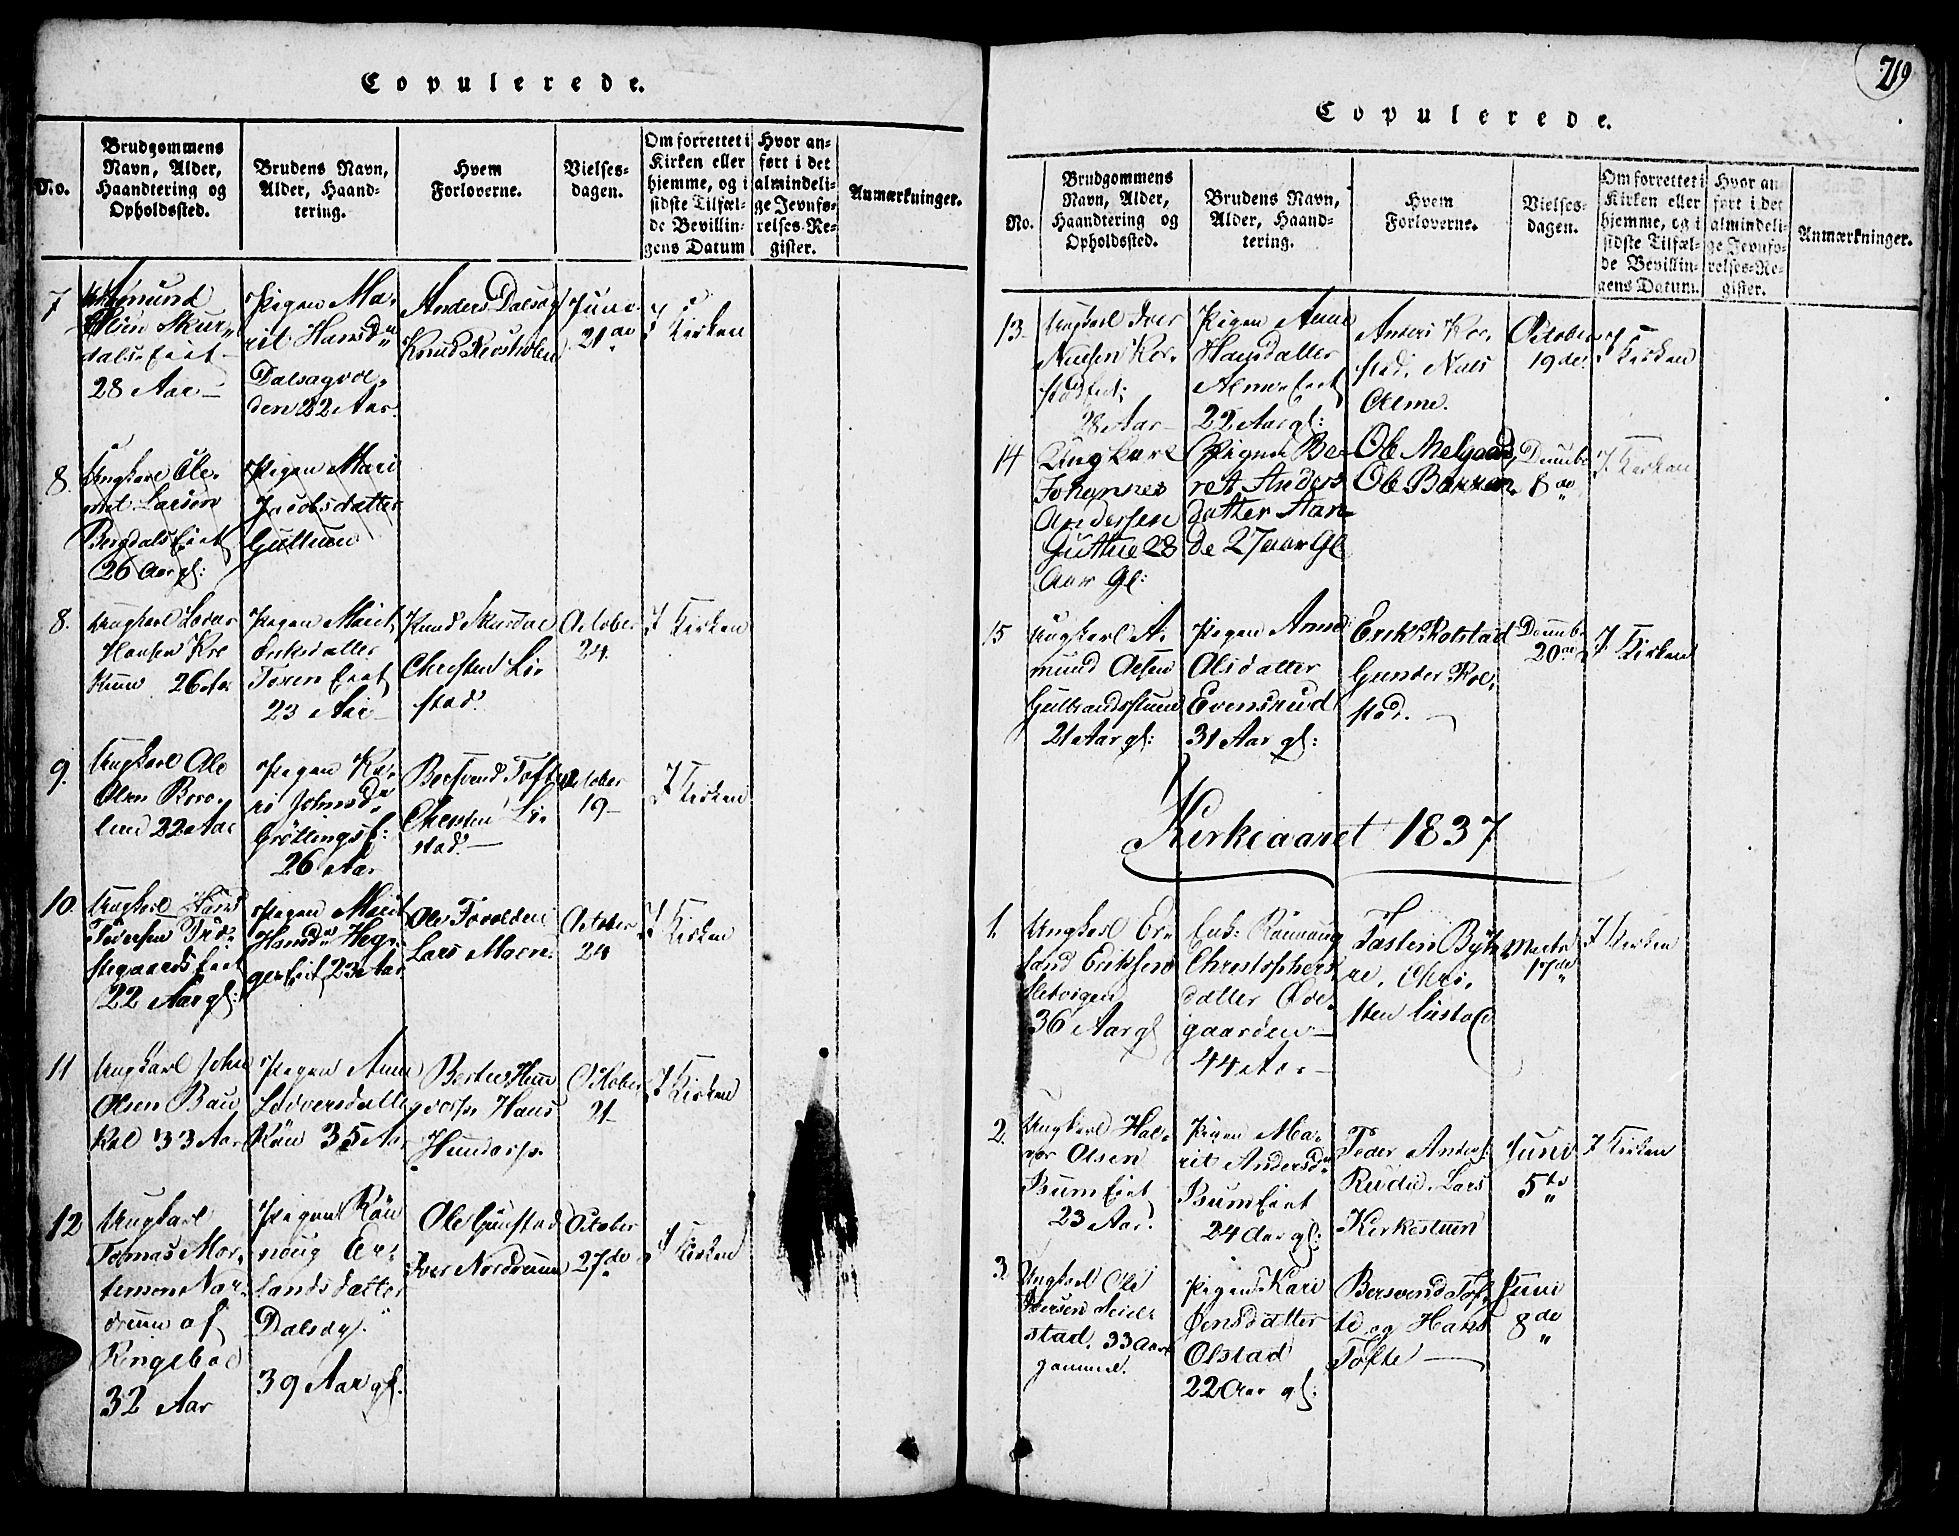 SAH, Fron prestekontor, H/Ha/Hab/L0001: Klokkerbok nr. 1, 1816-1843, s. 219